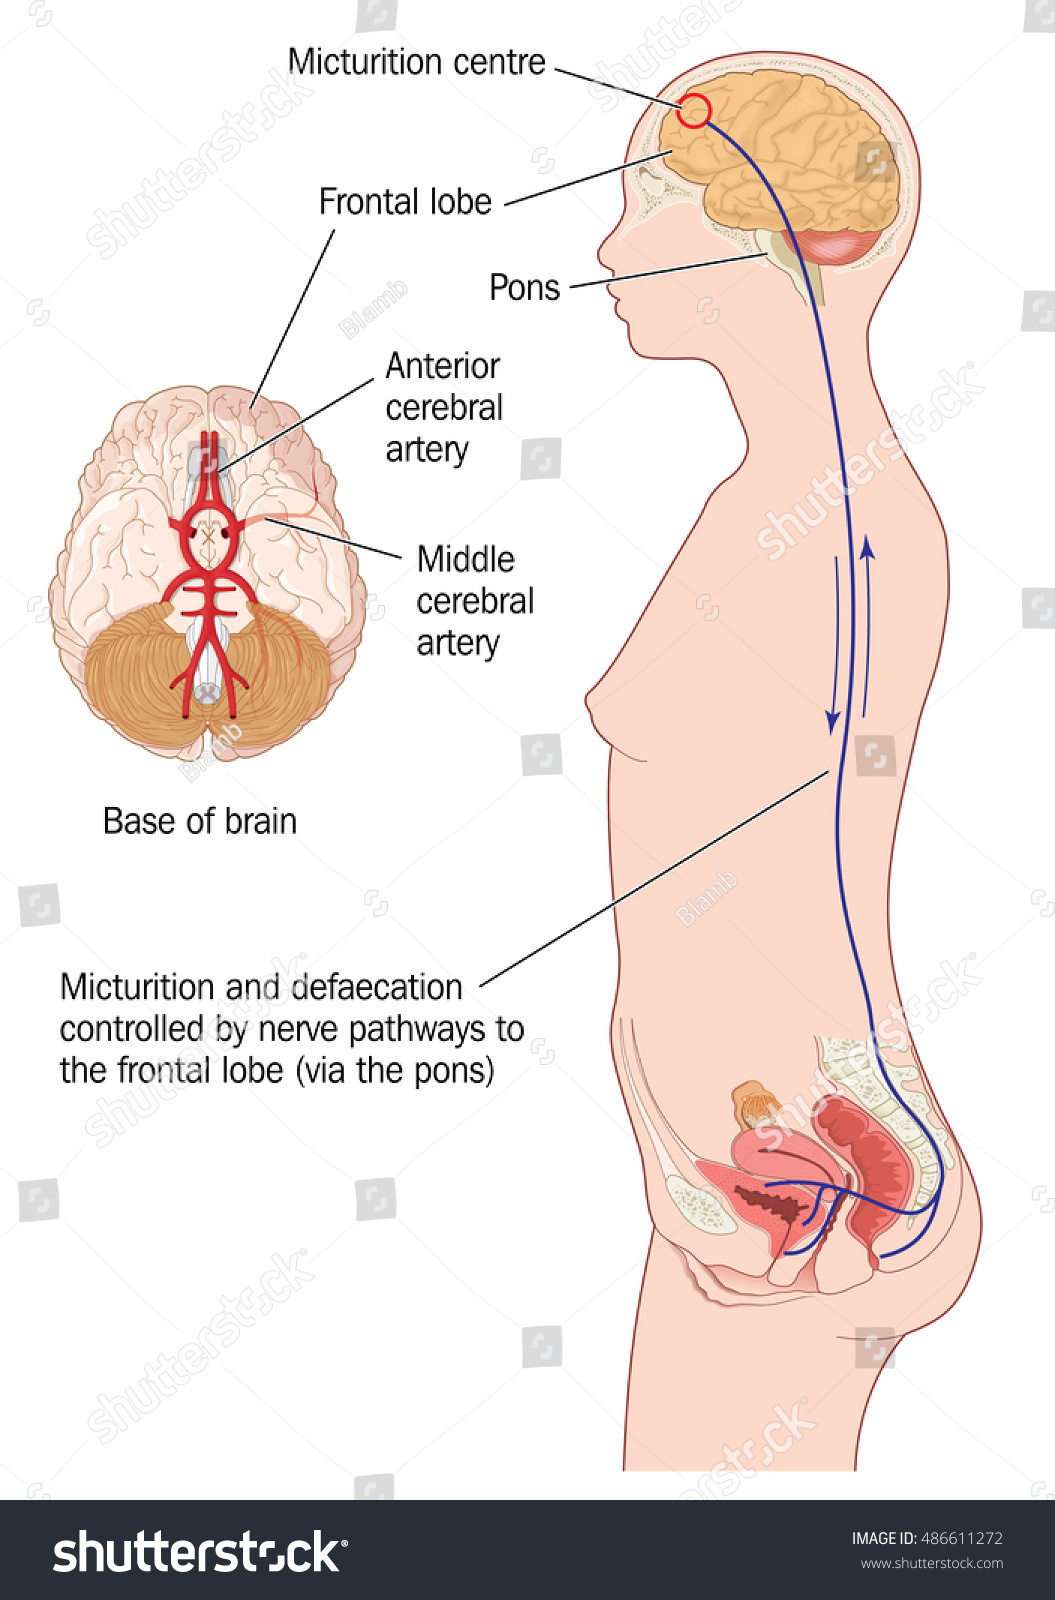 Nerve Pathways Frontal Lobe Brain Urinary Stock Illustration